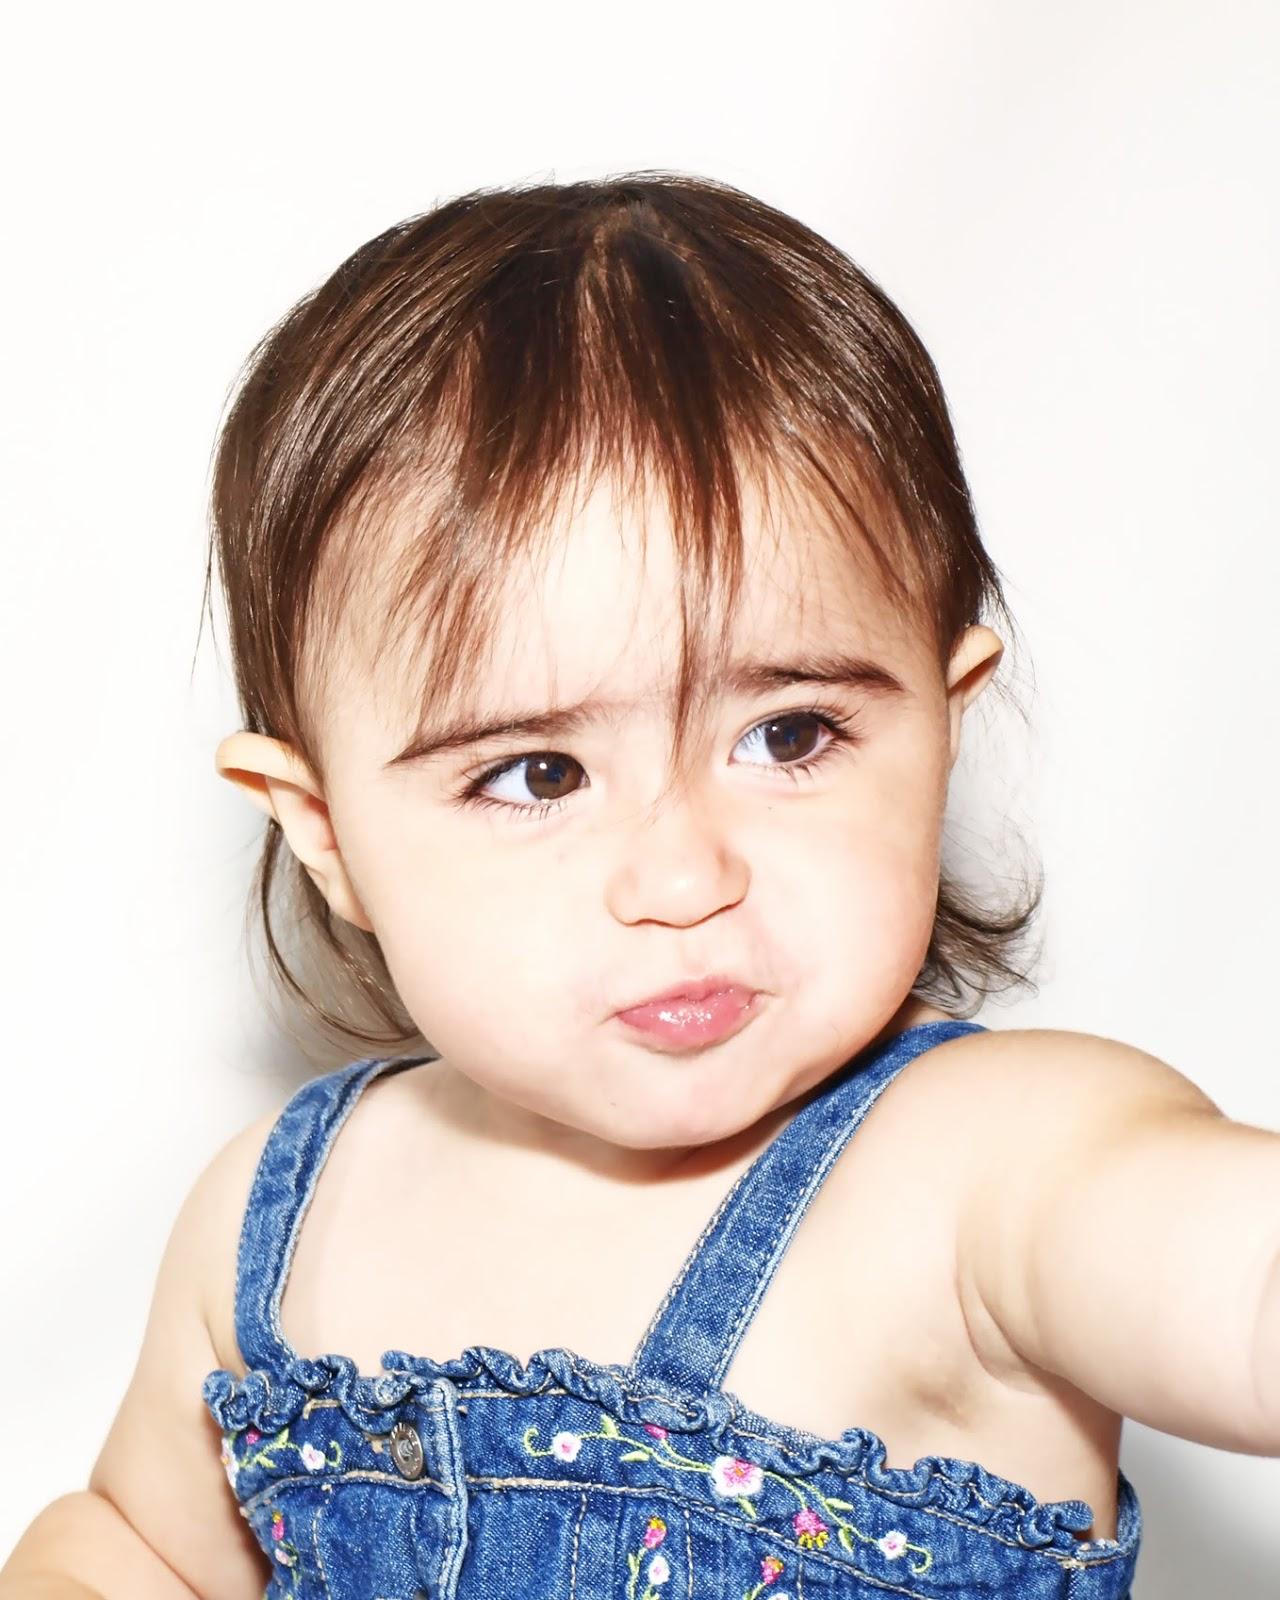 Ikbhal: Cute Babies